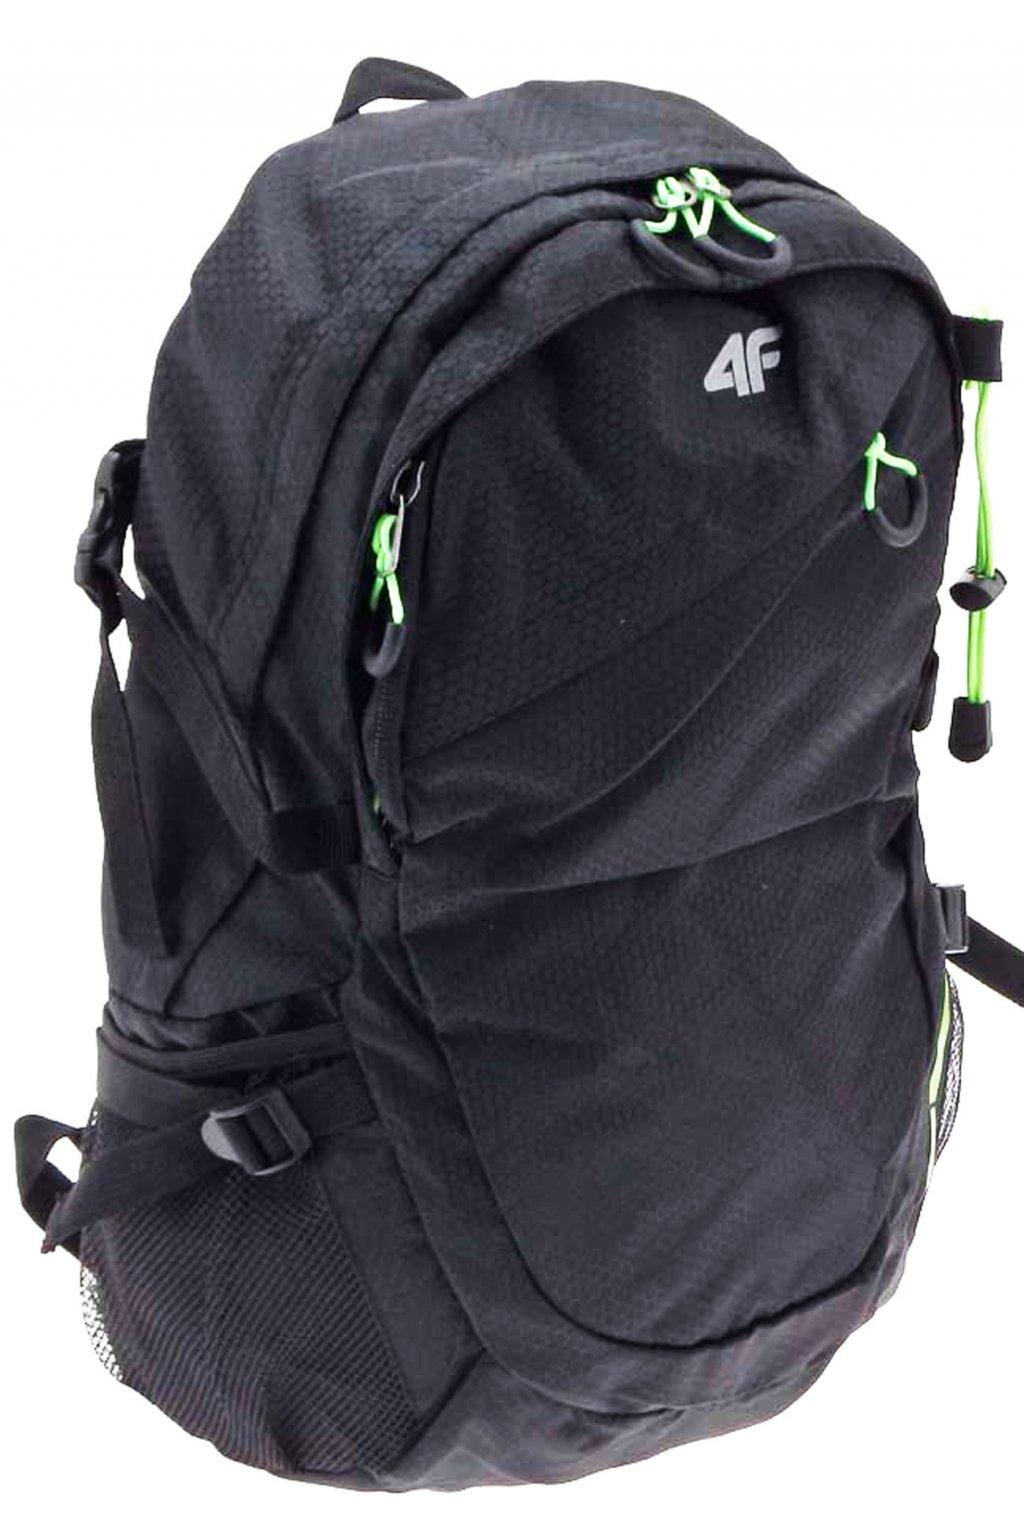 Sportovní batoh 4F B10 PCU017 20S C